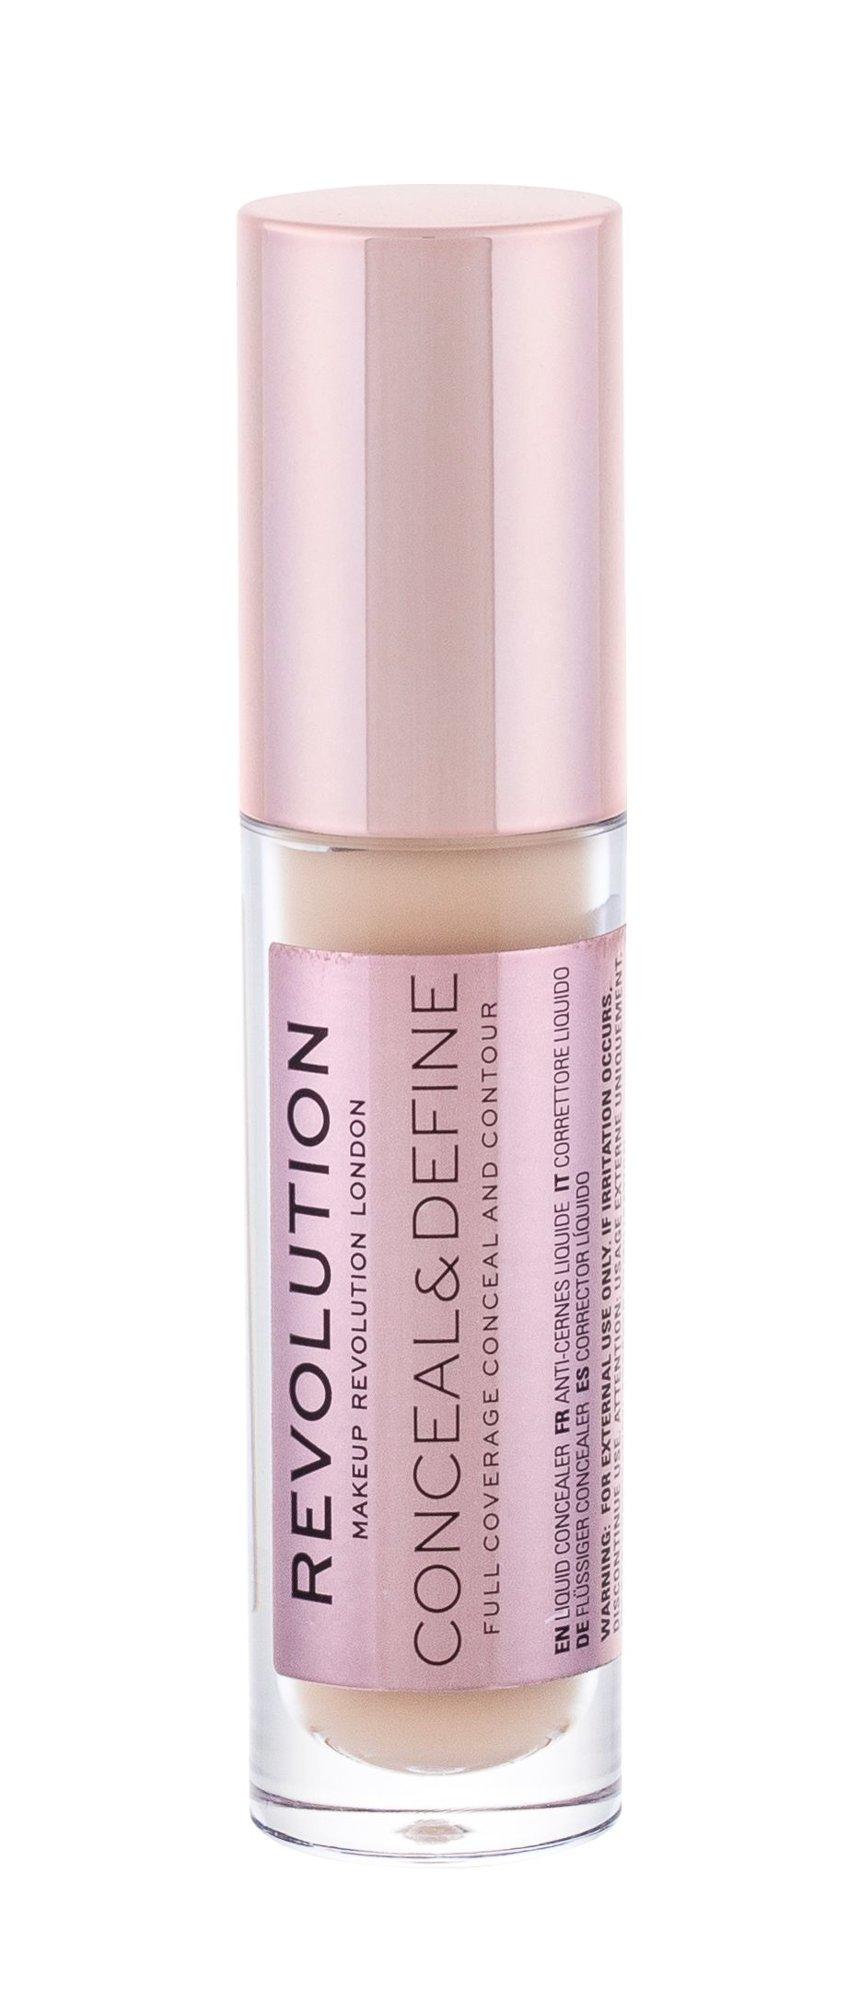 Makeup Revolution London Conceal & Define Corrector 4ml C5